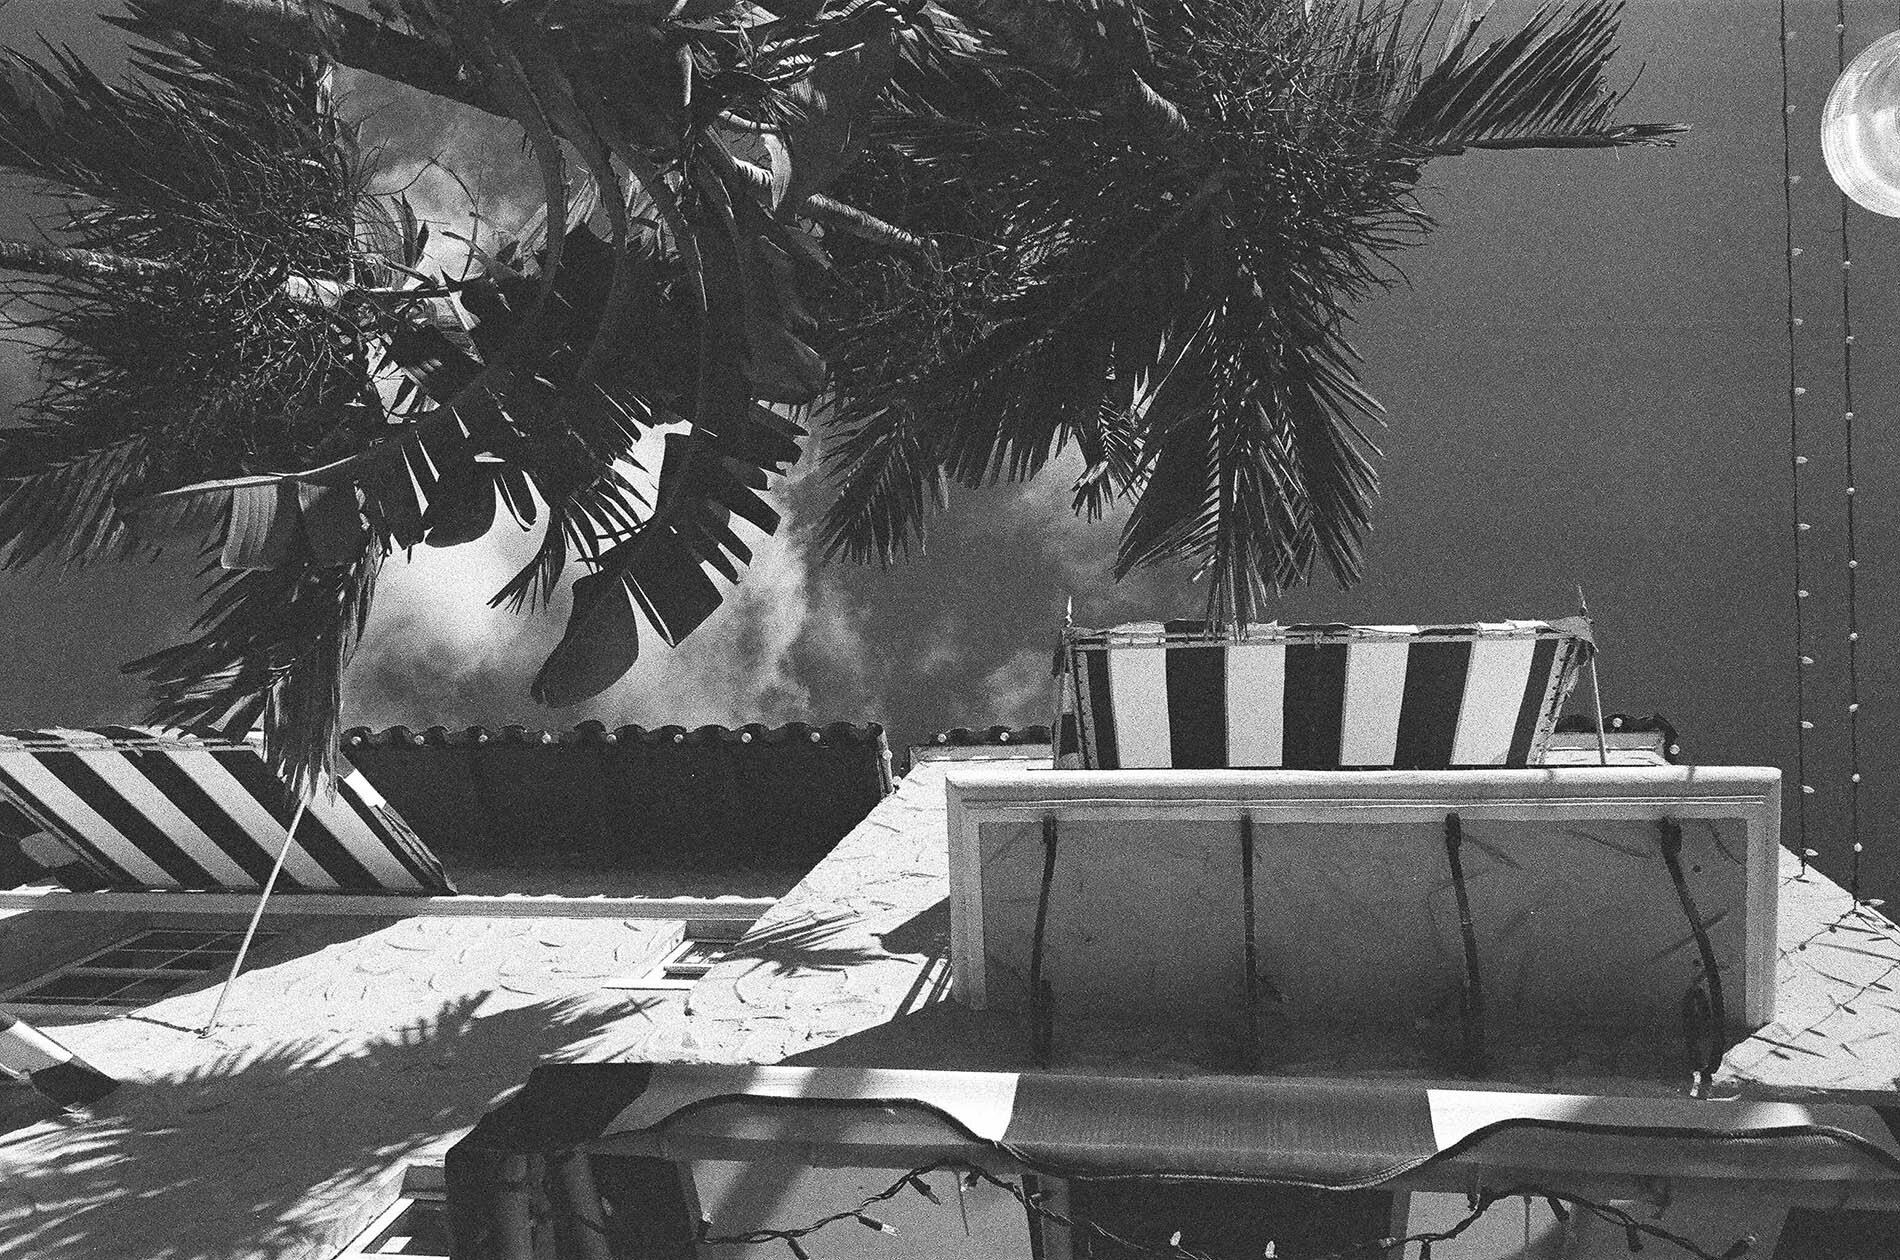 'Miami's Perspective' 2014